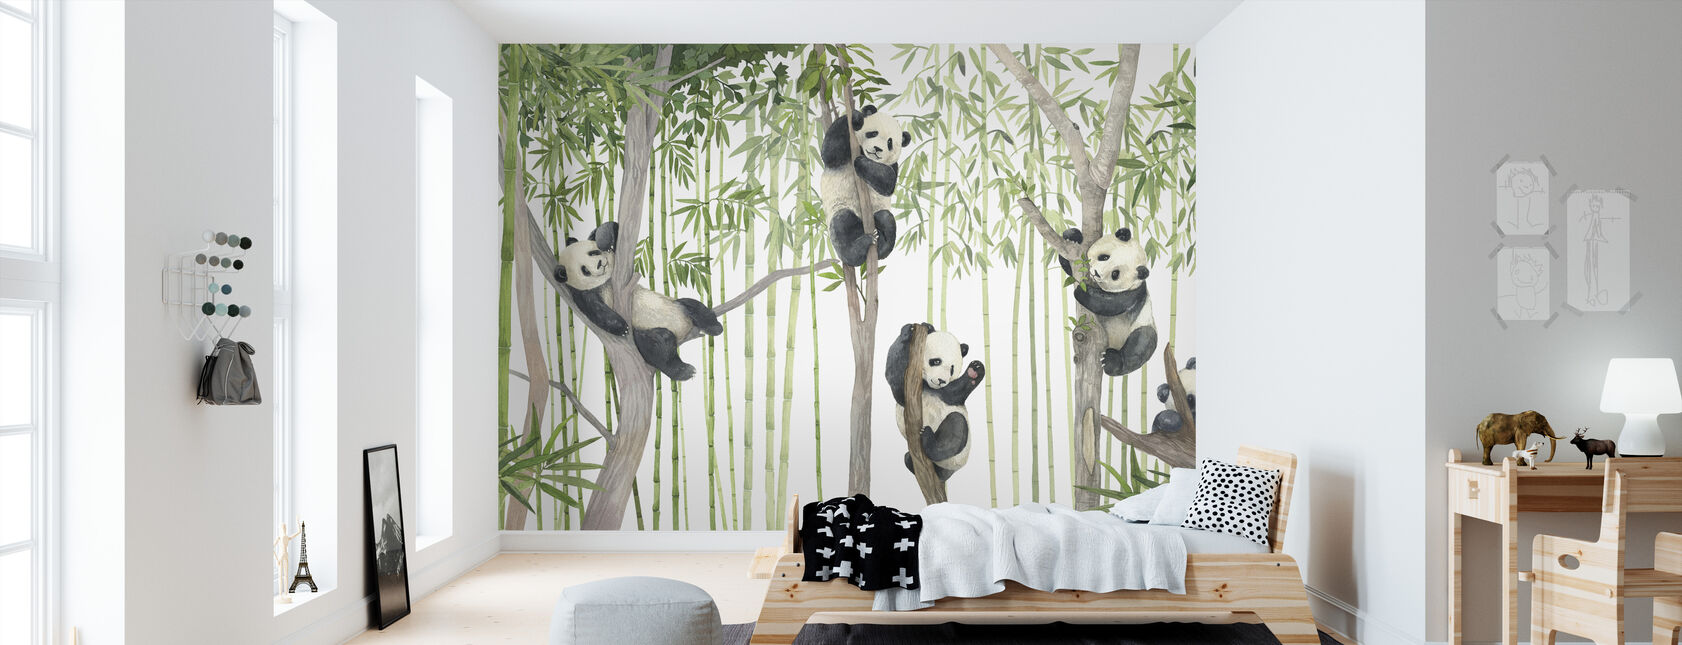 Panda Friends - Bright - Wallpaper - Kids Room